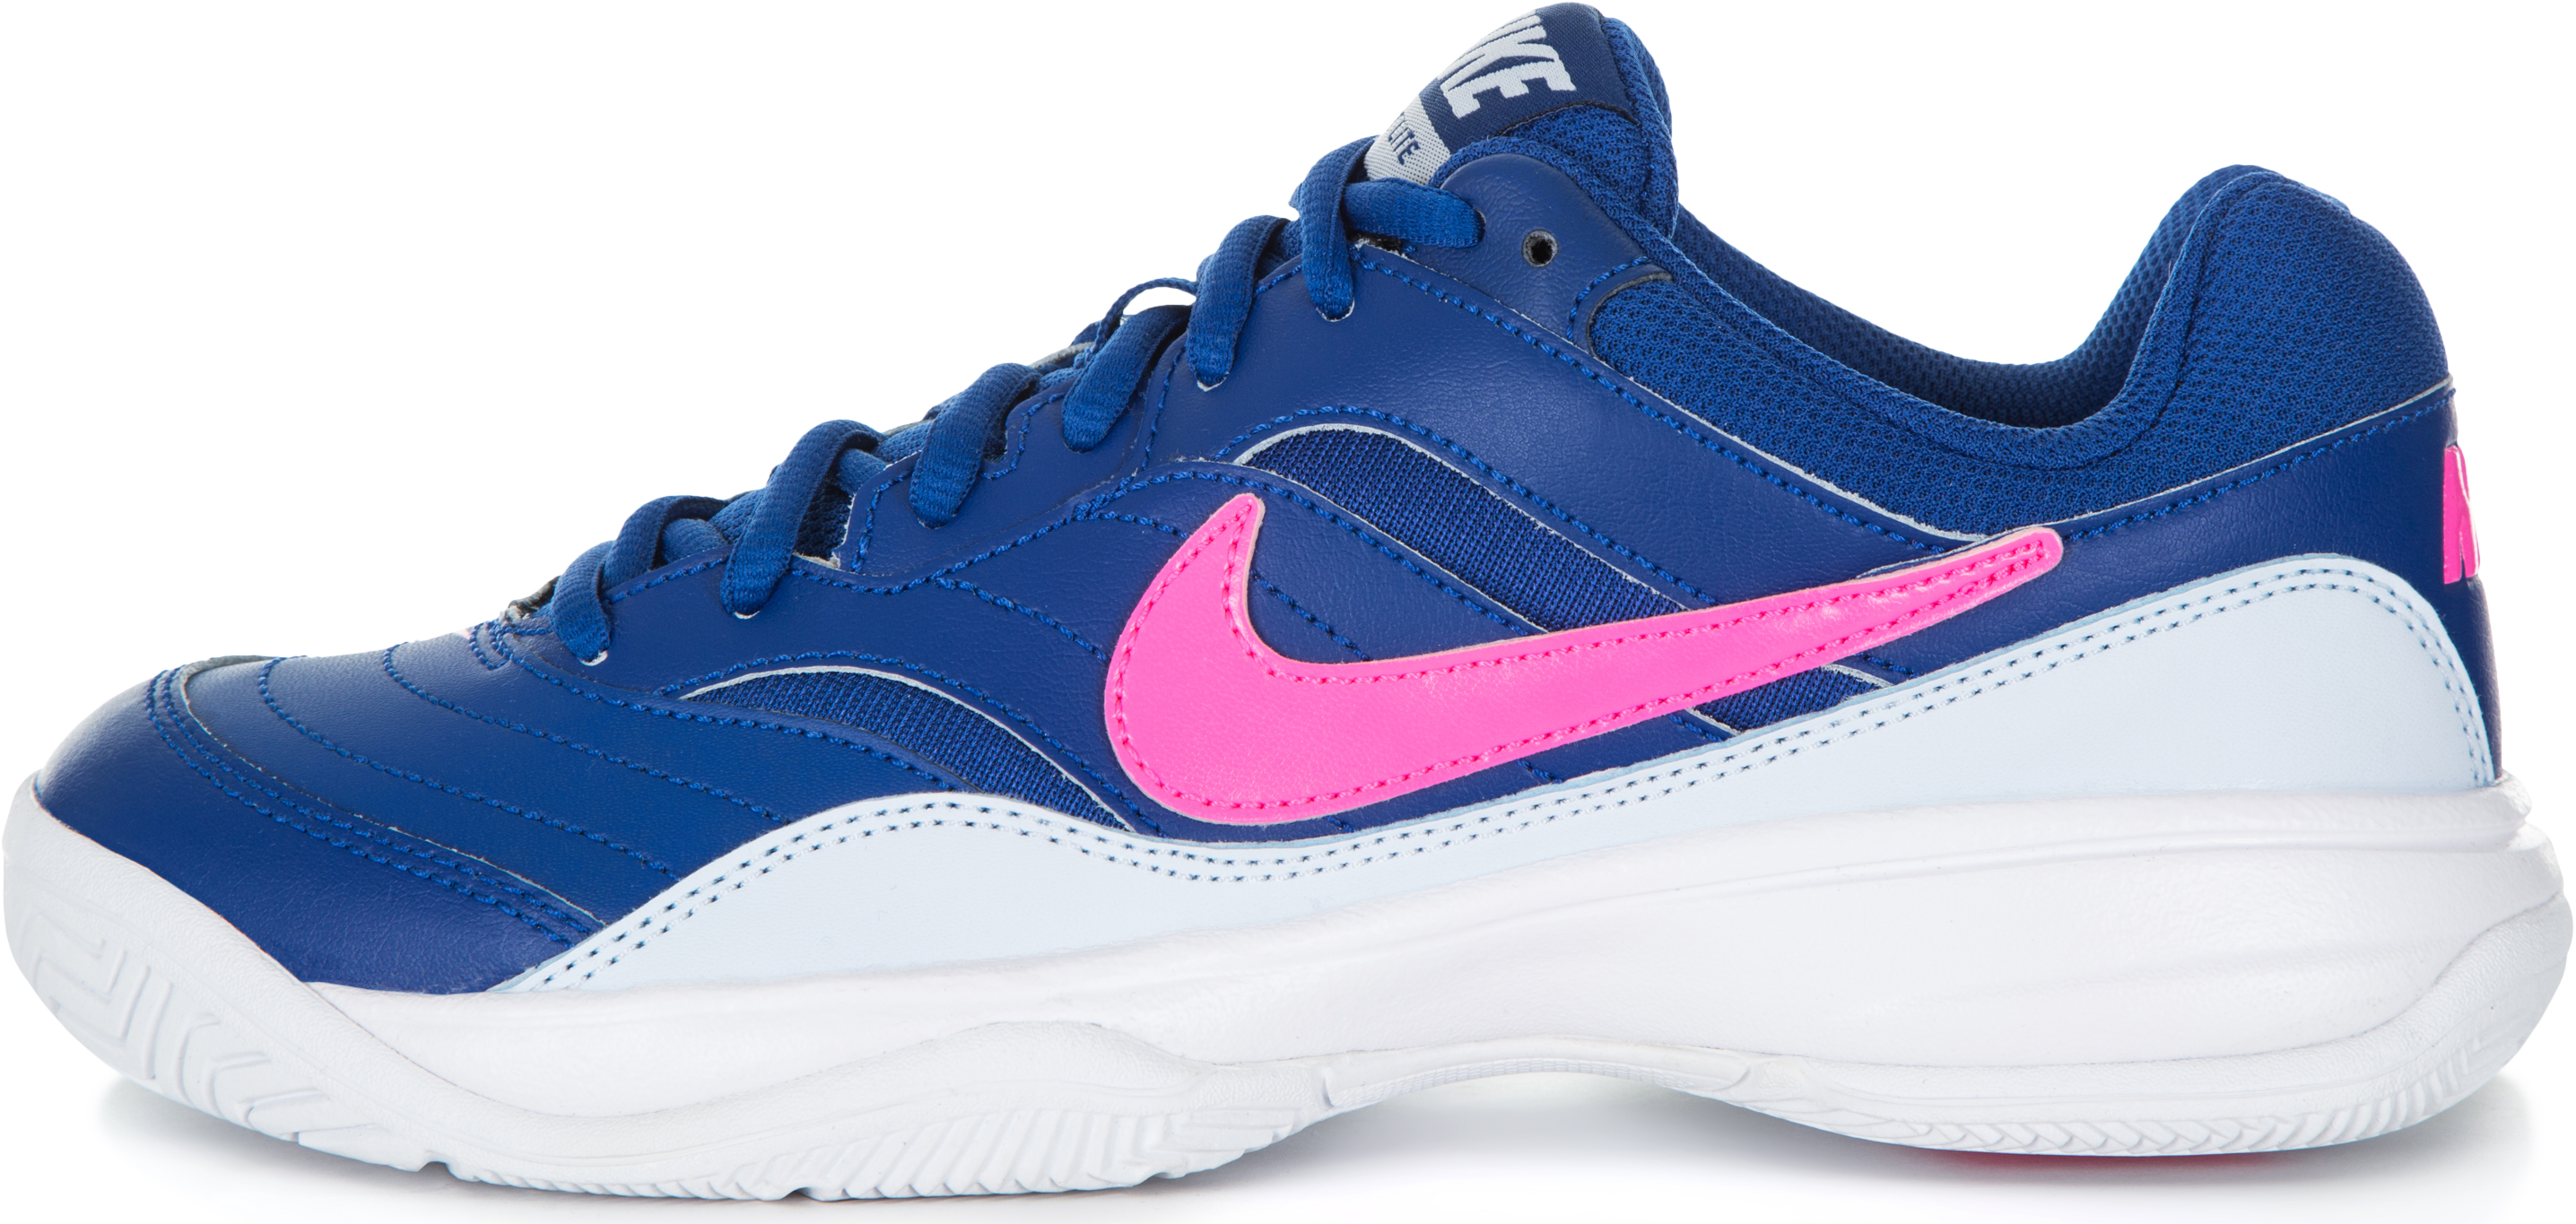 Nike Кроссовки женские Court Lite, размер 39,5